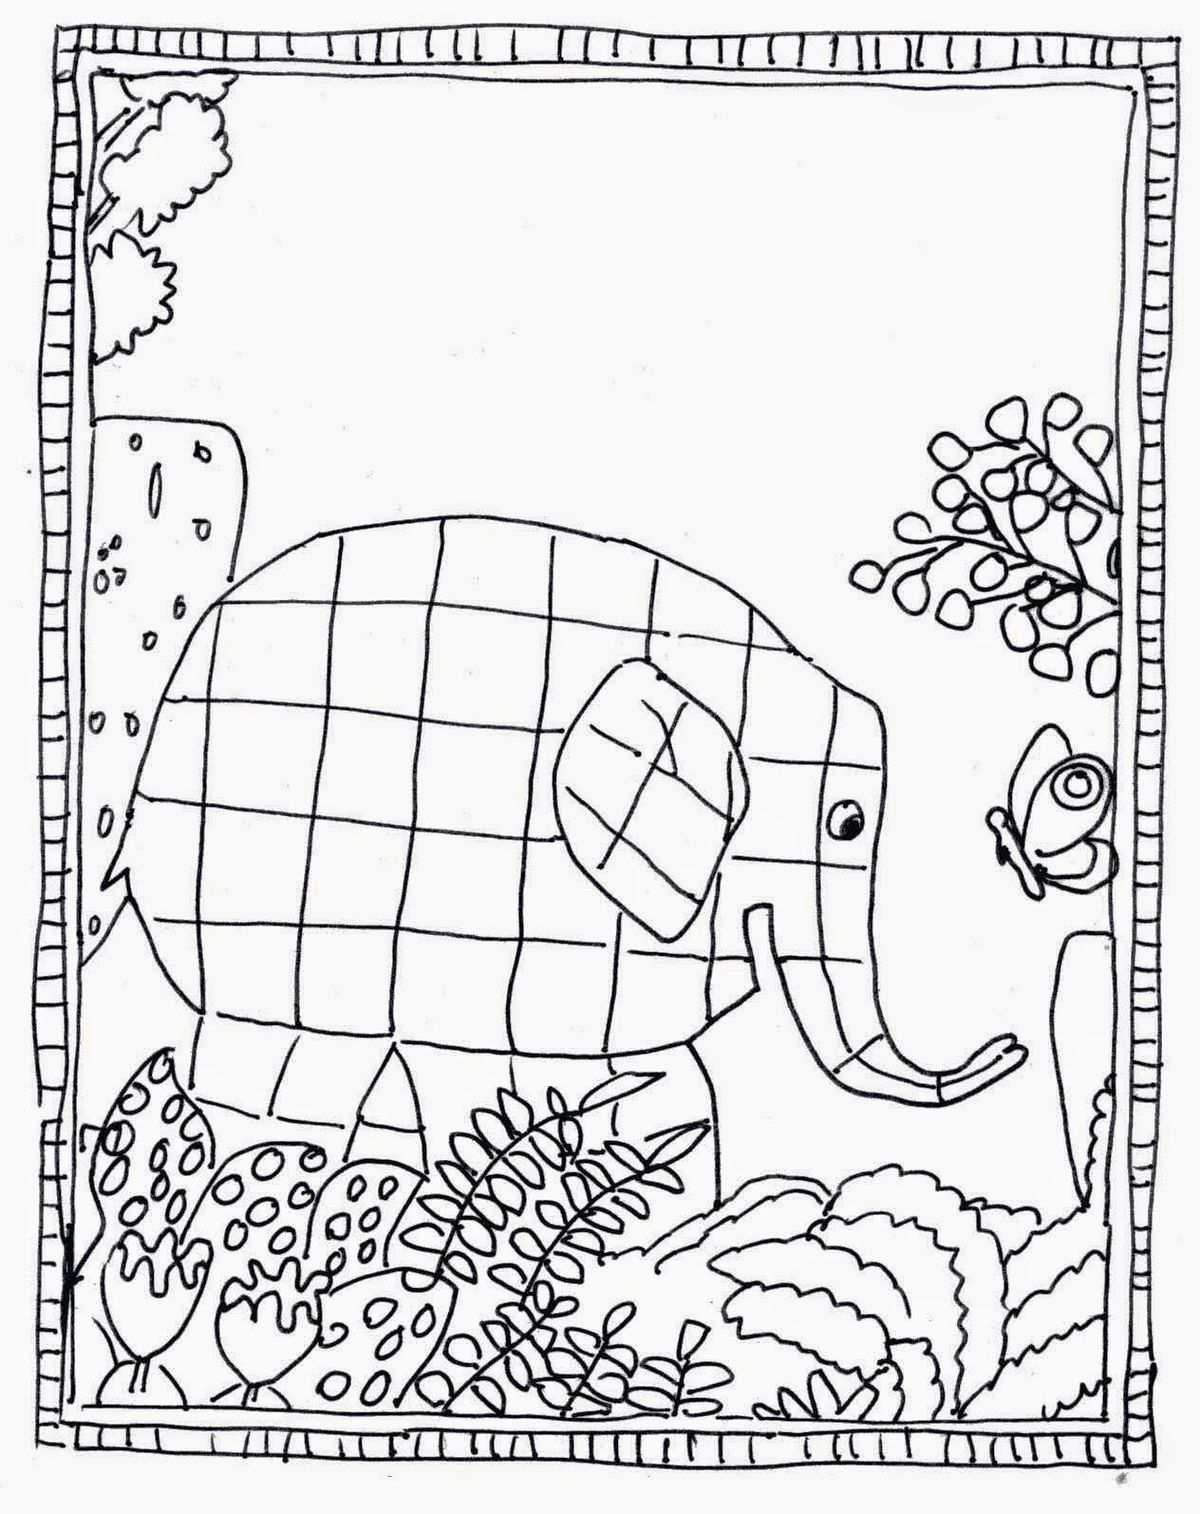 Mikapanteleon Pawakomastonhpiagwgeio Ta Xrwmata Sto Nhpiagw Childrens Books Activities Elmer Elmer The Elephants